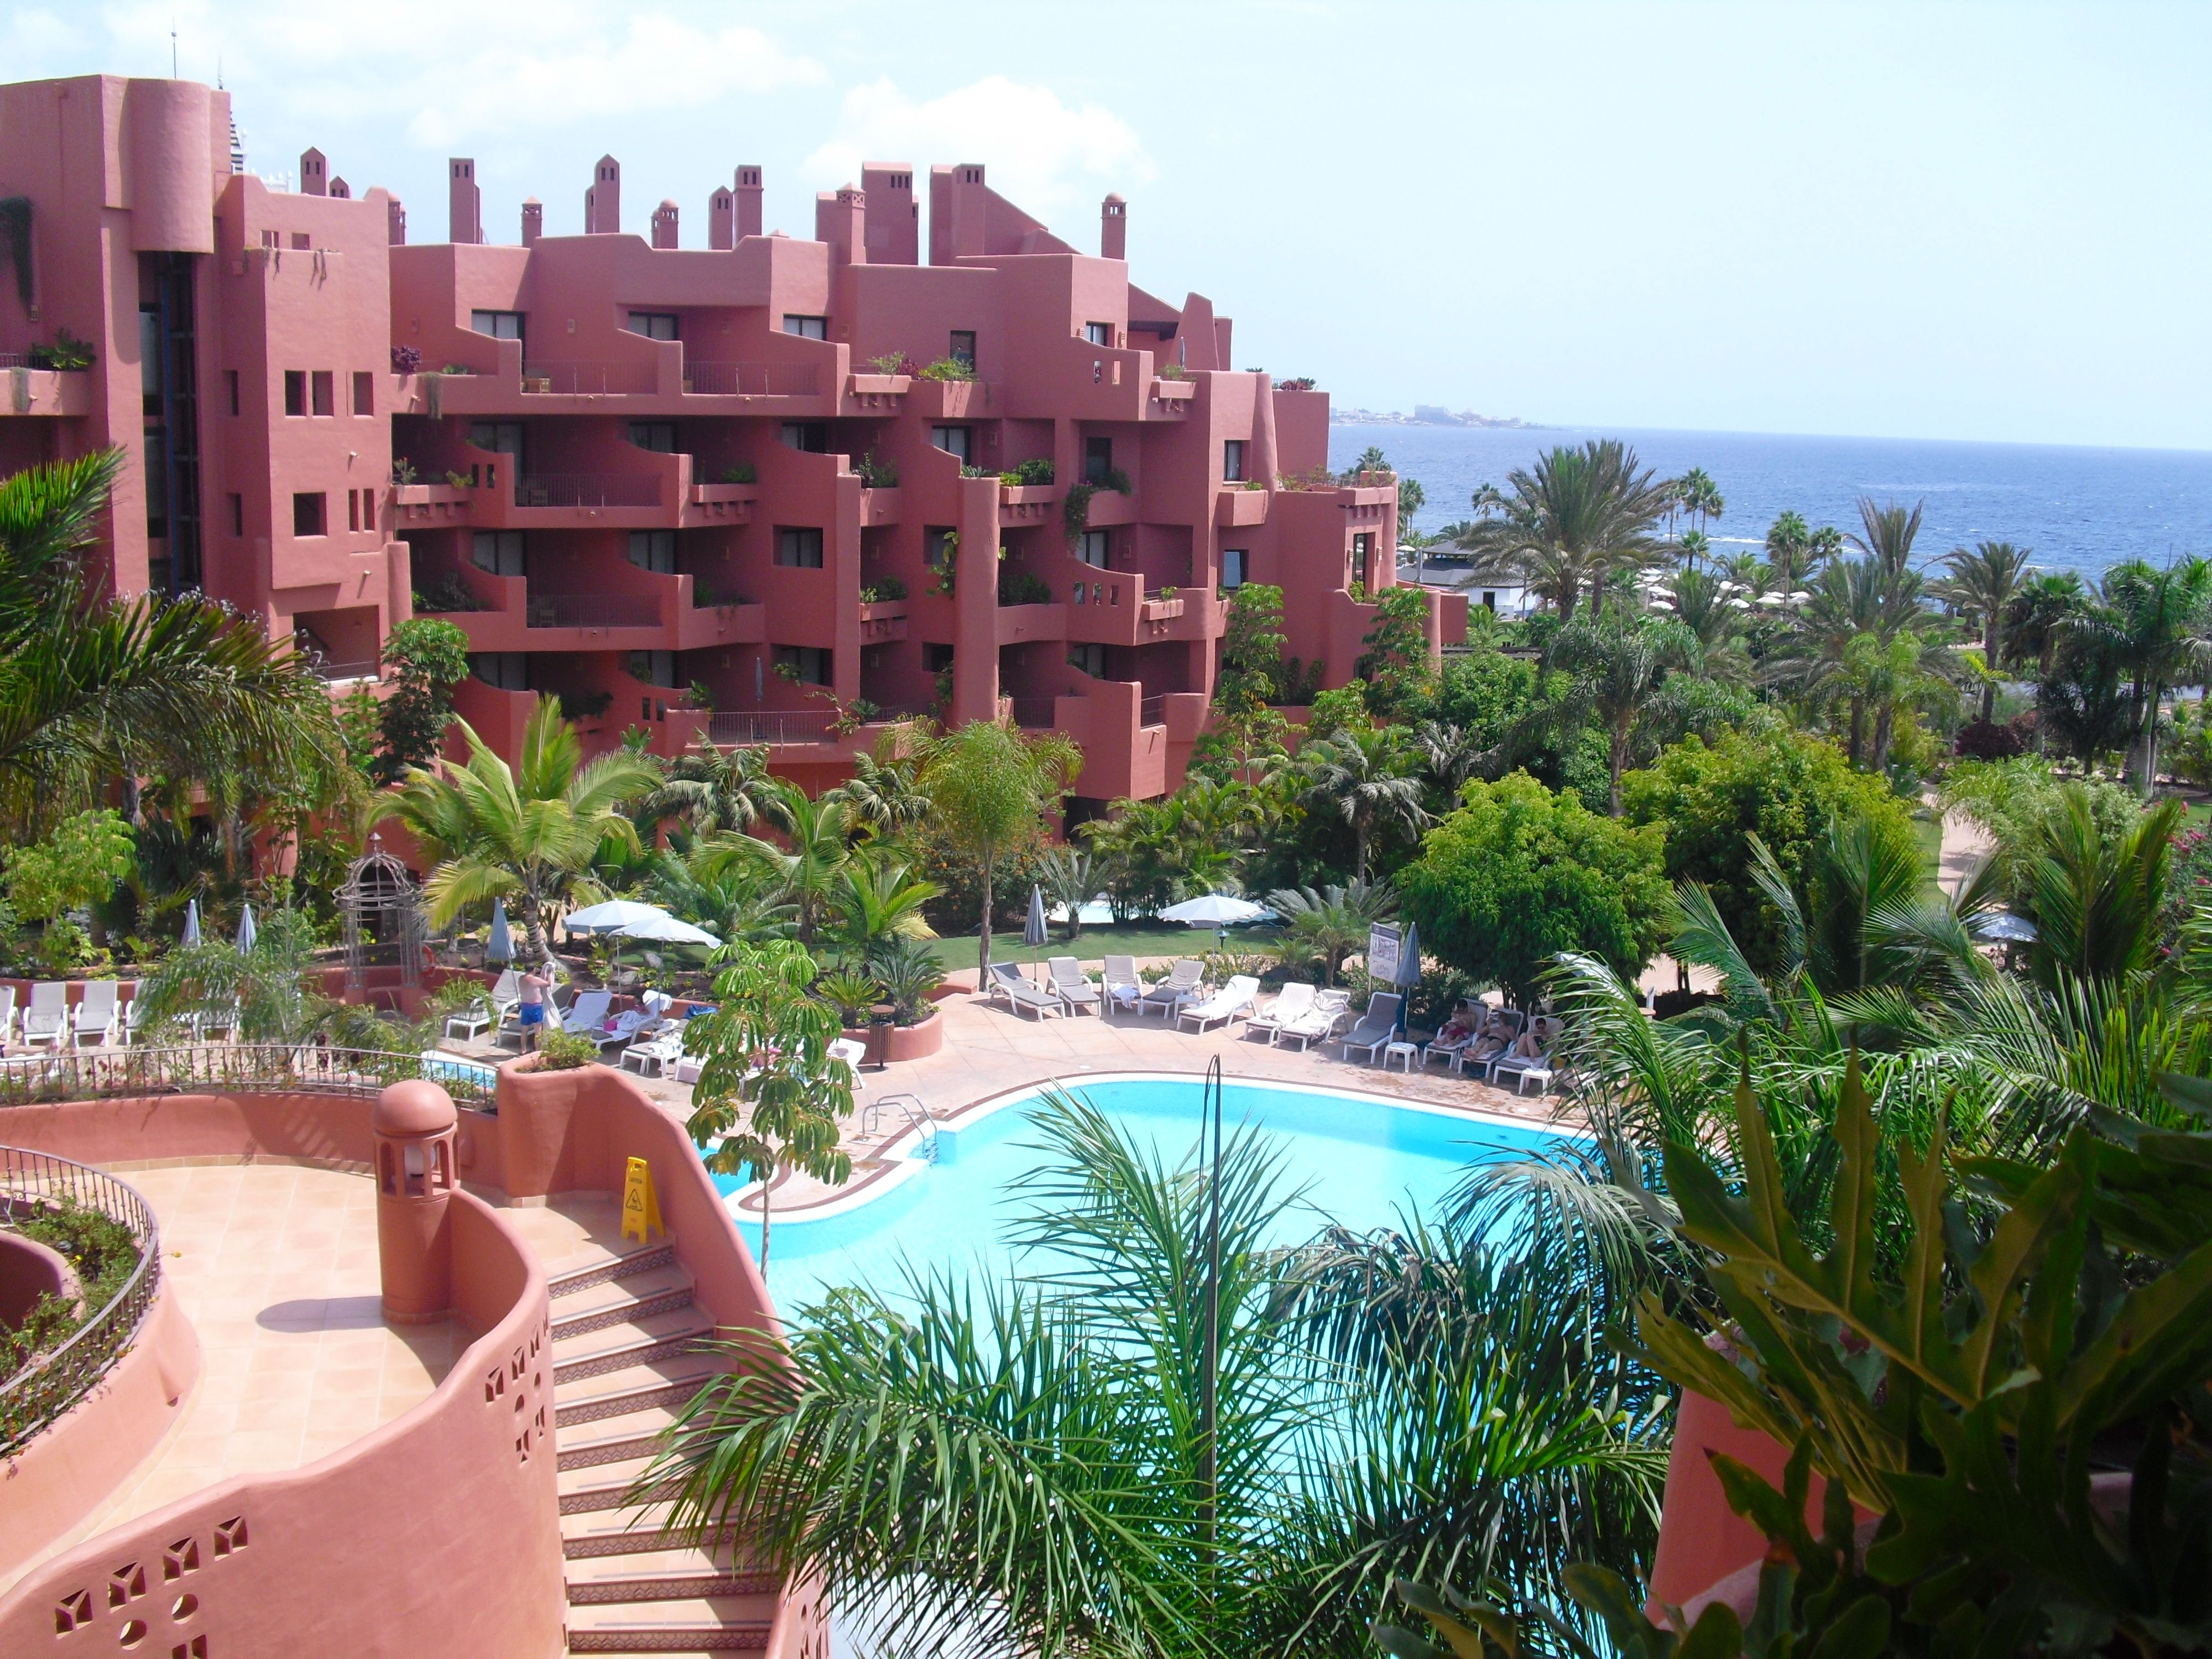 Hotel Sheraton La Caleta Resort & Spa. Tenerife